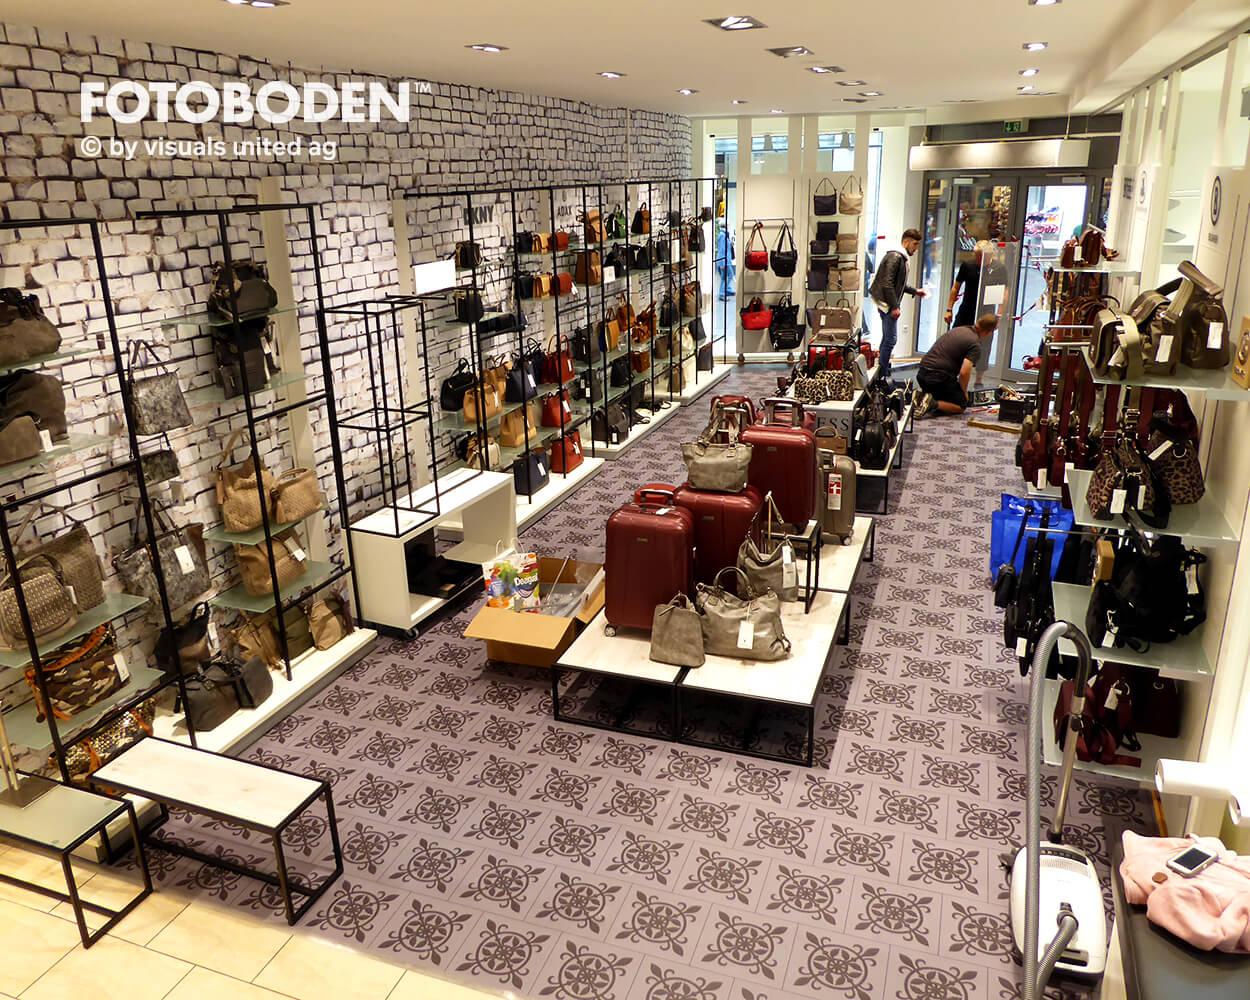 Dittfeld Ladenbau Ladengestaltung Fußboden Verkaufsfläche Bodengestaltung Boden Foto Fotoboden Fotomotiv Motiv Druck Visual Merchandising Point Of Sale POS2